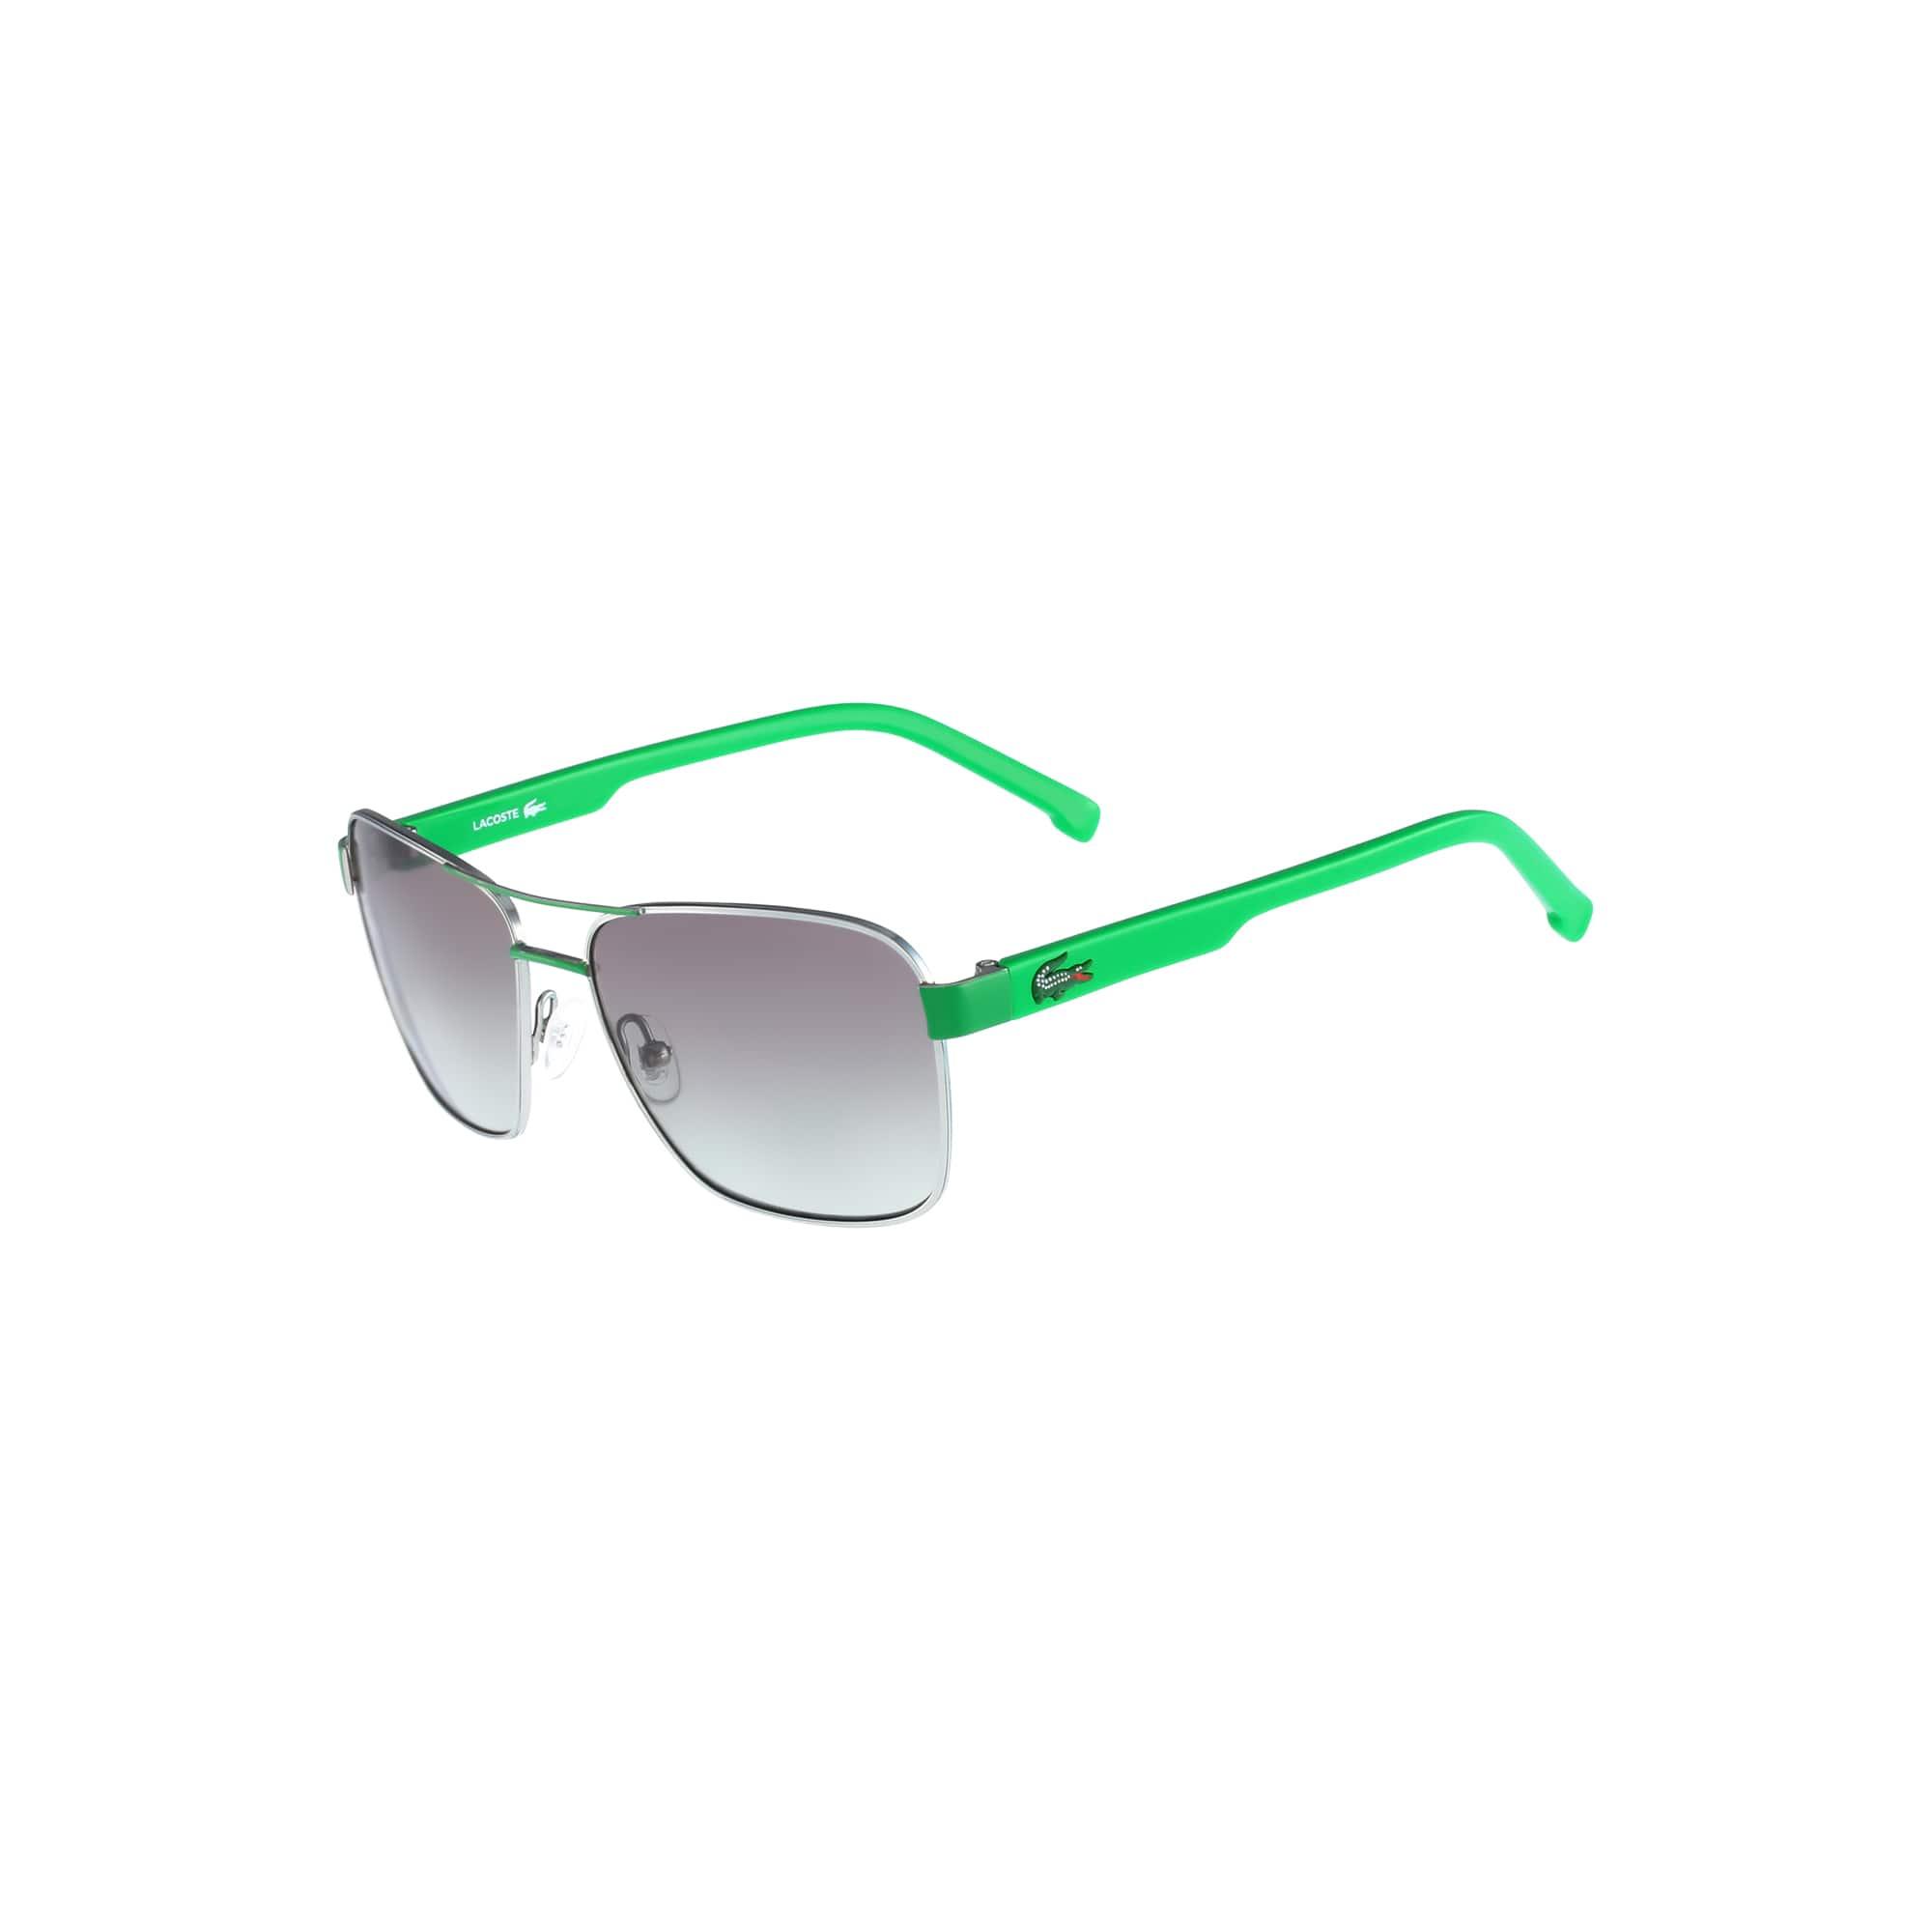 Sunglasses T(w)eens